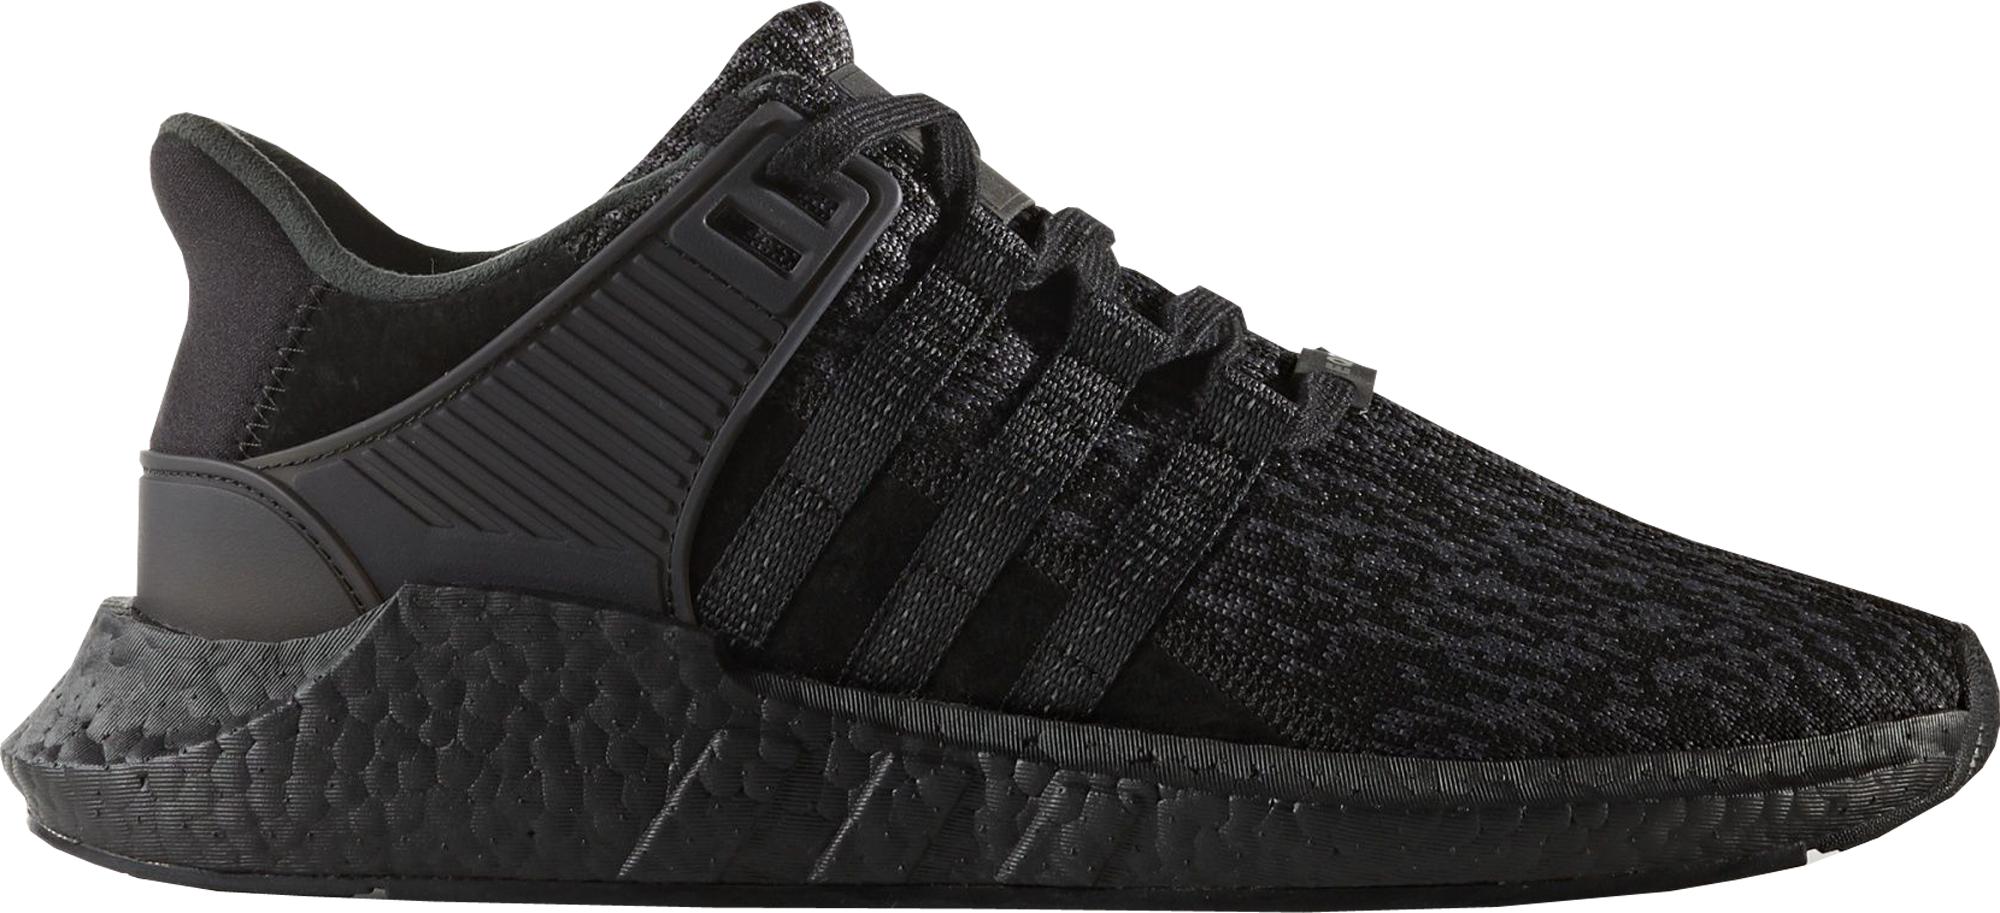 adidas eqt support 93/17 triple black EROQNQM